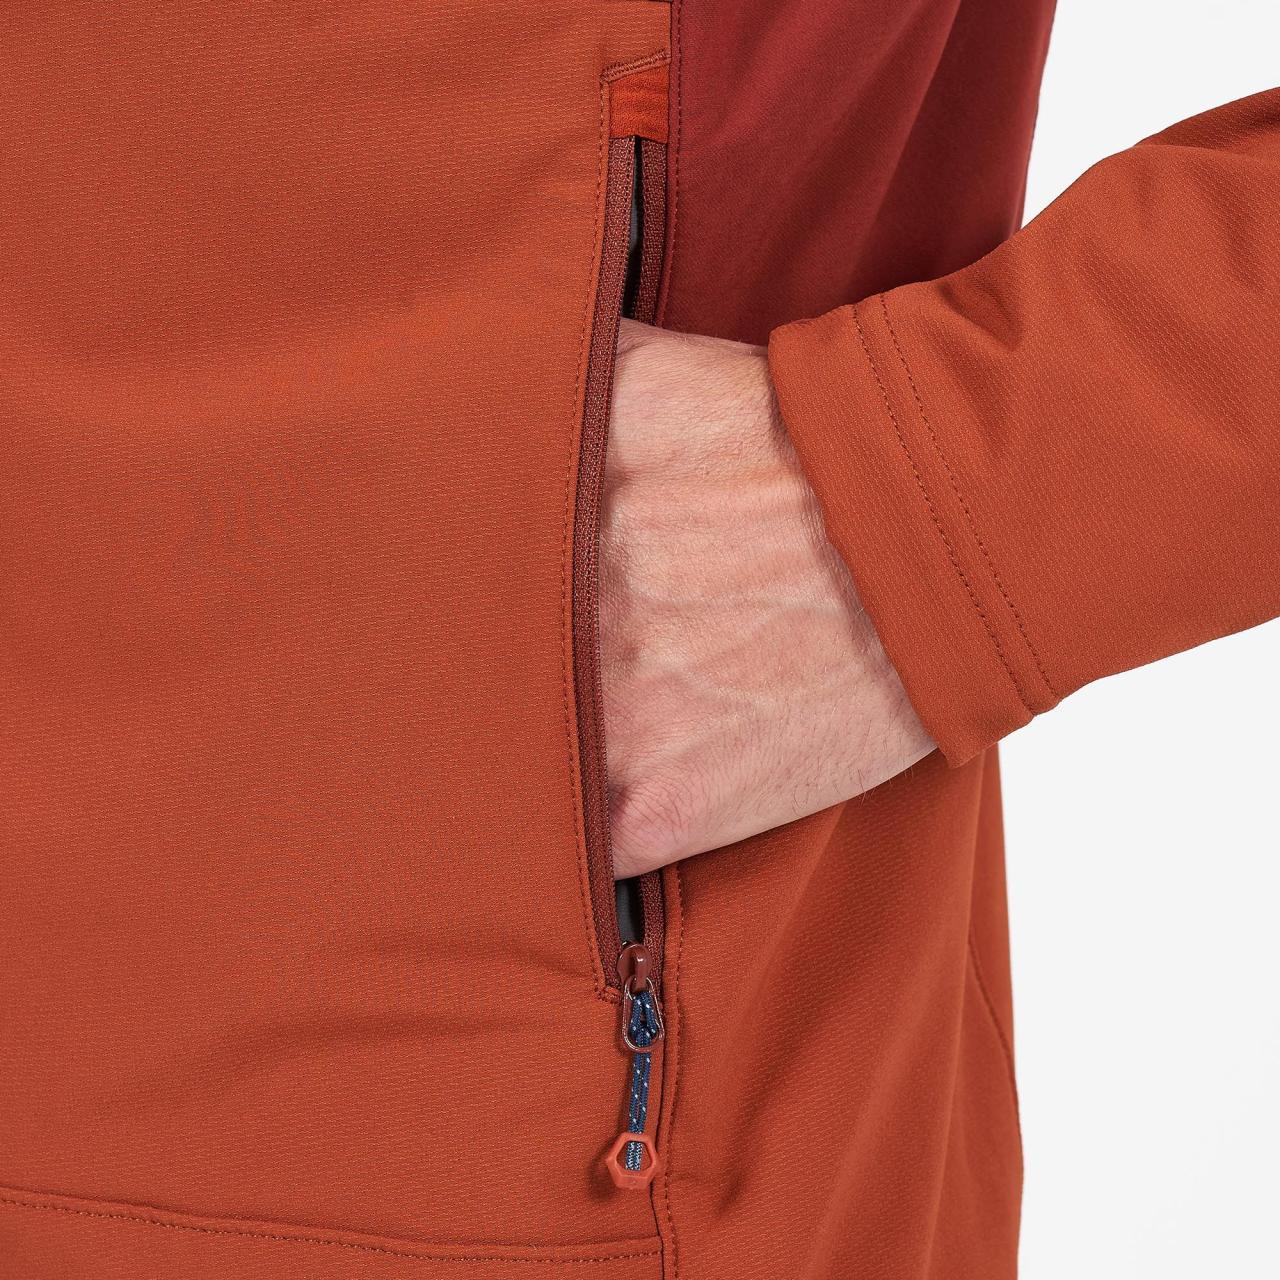 KRYPTON JACKET-OXIDE ORANGE-M pánská bunda rezavá